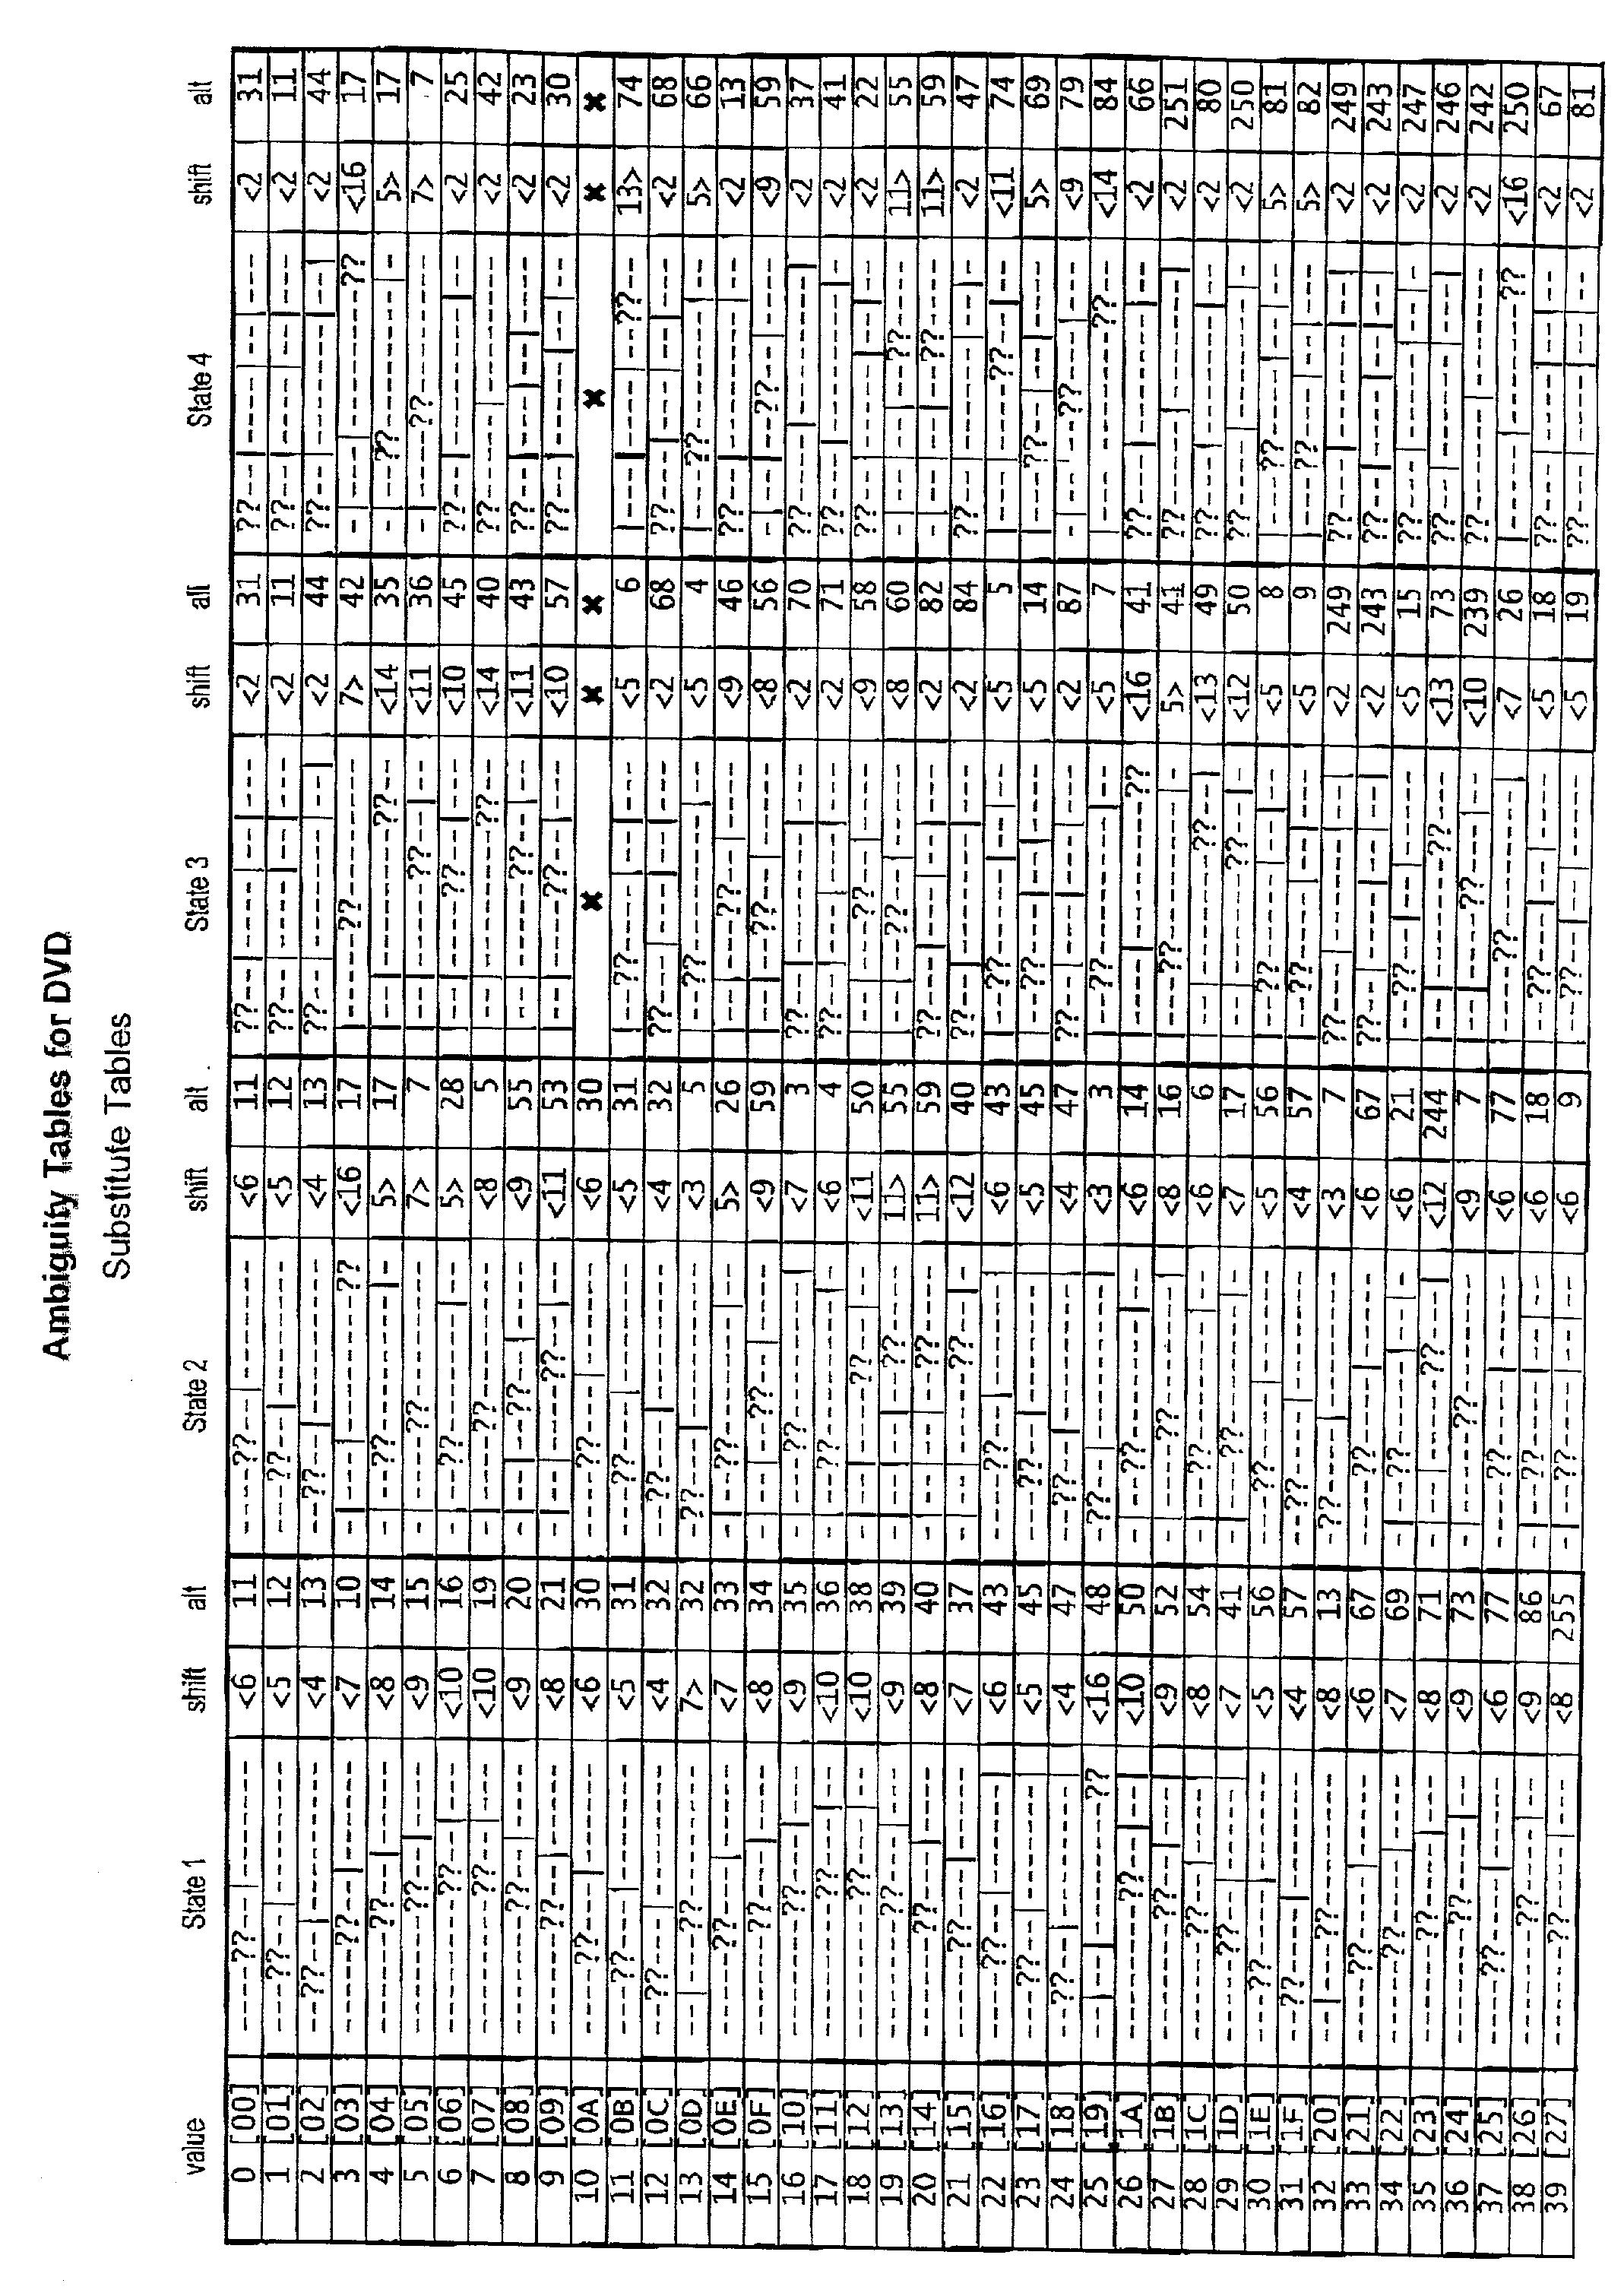 Figure US20020069389A1-20020606-P00009